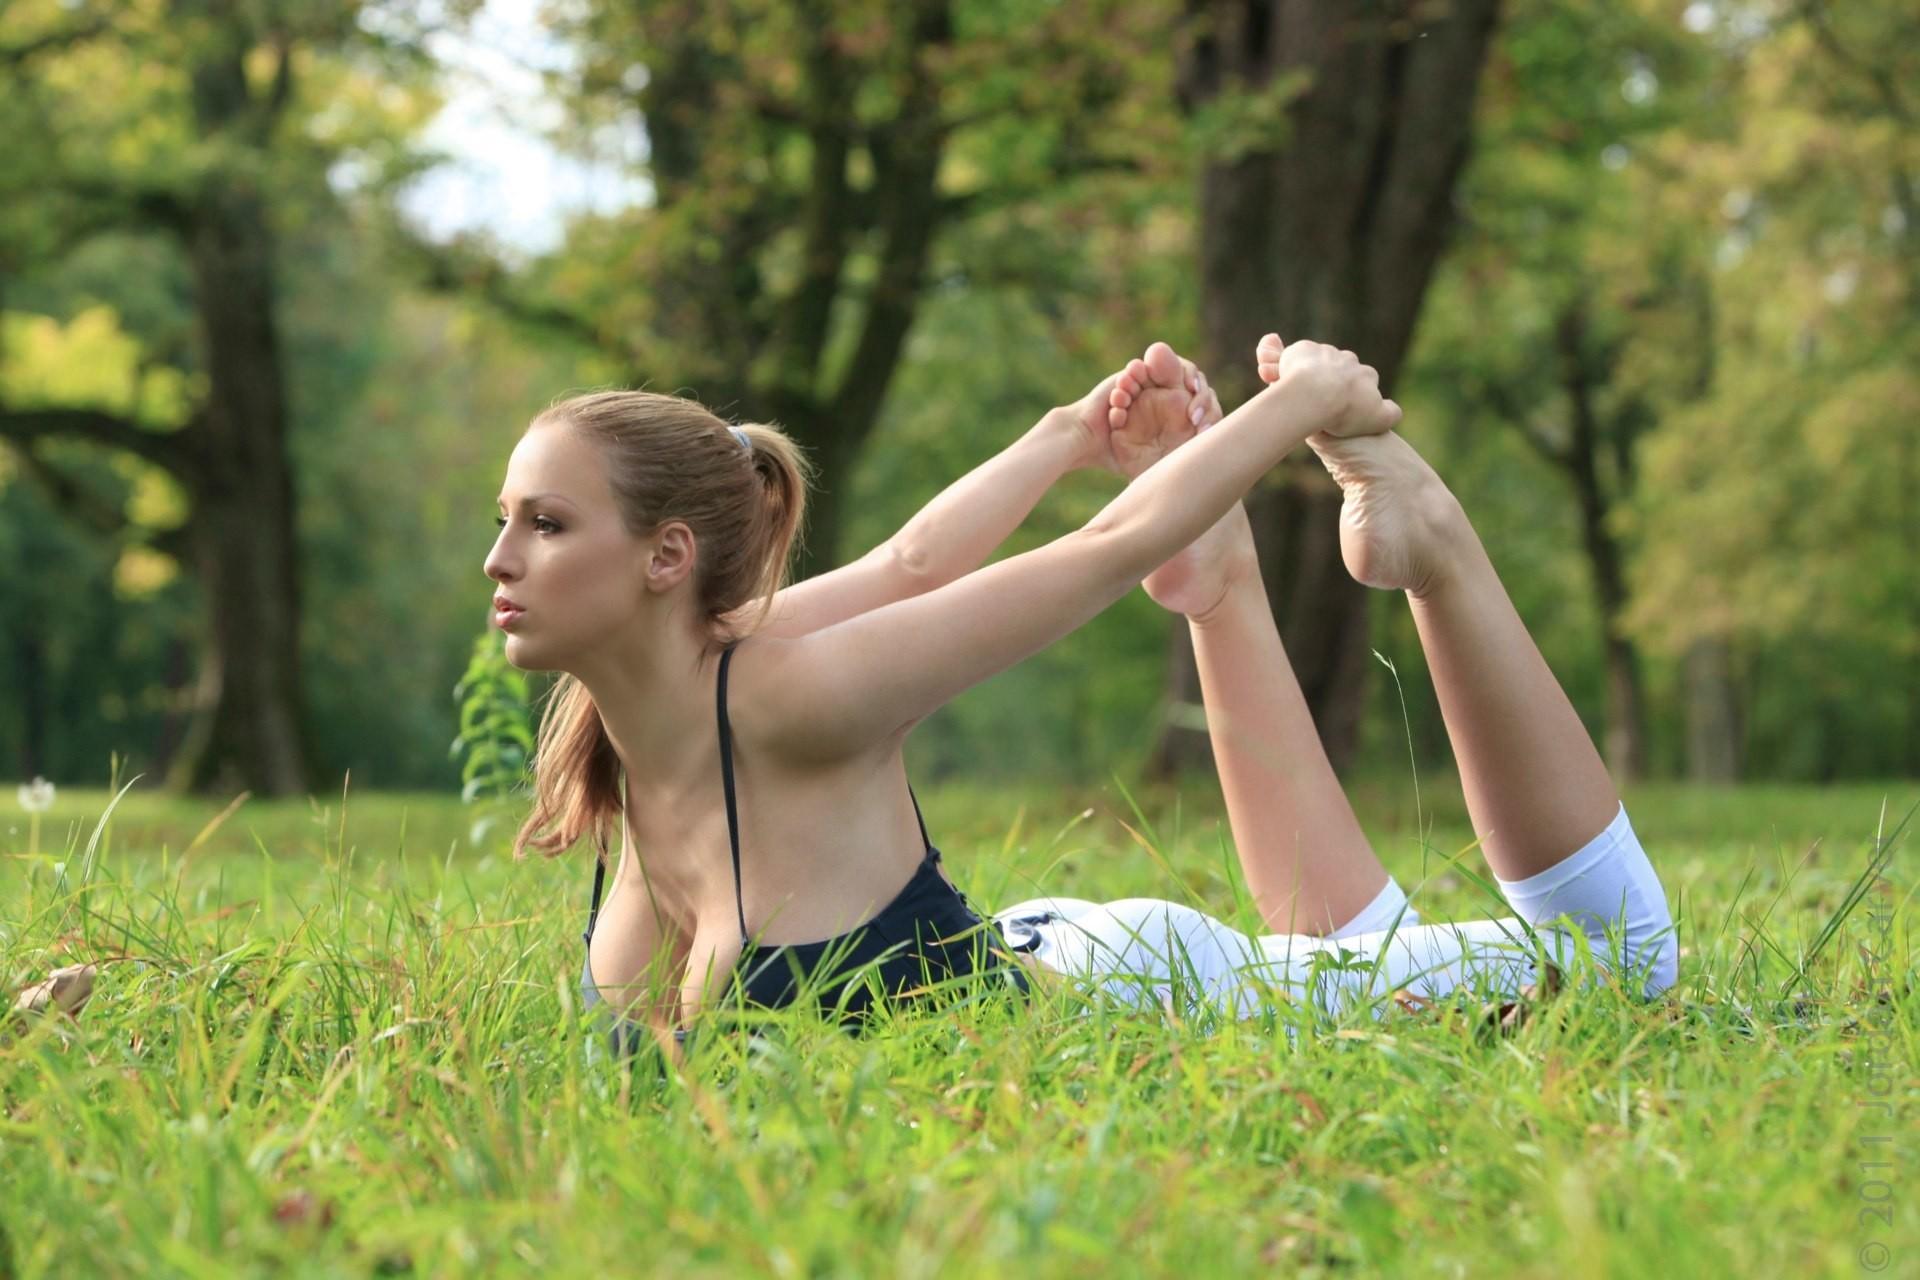 Natural outdoor teen